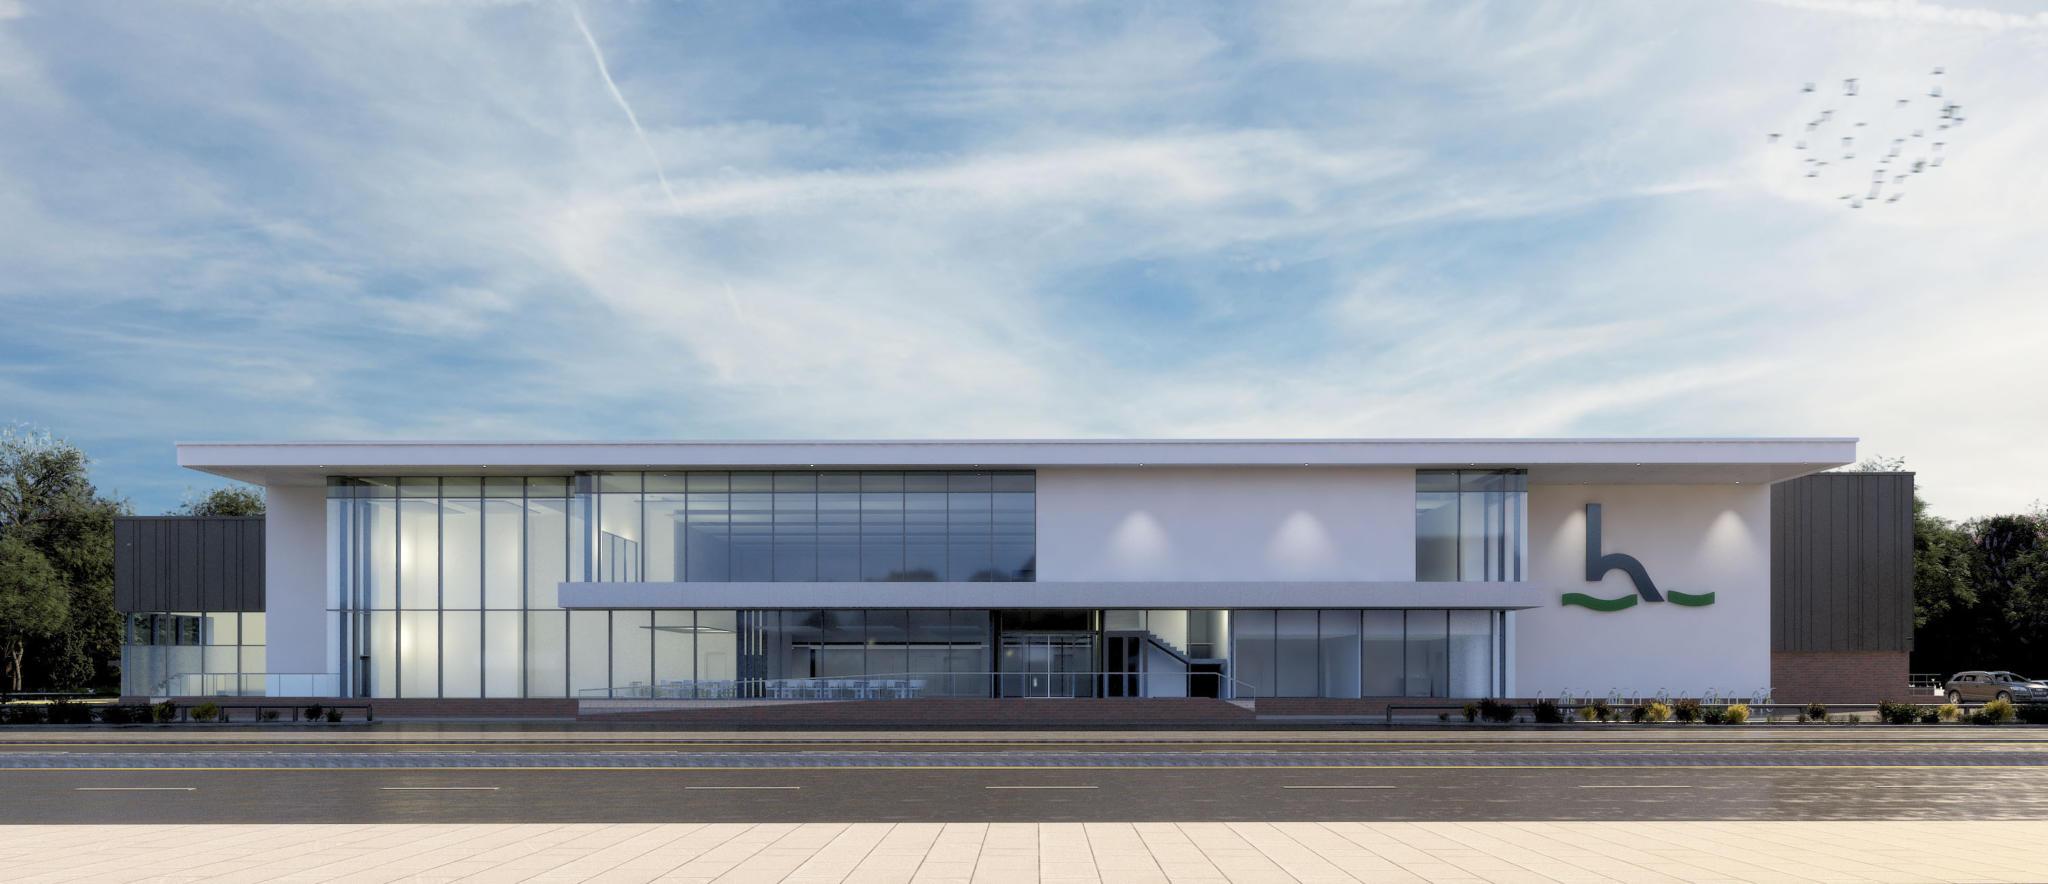 Halton Leisure Centre